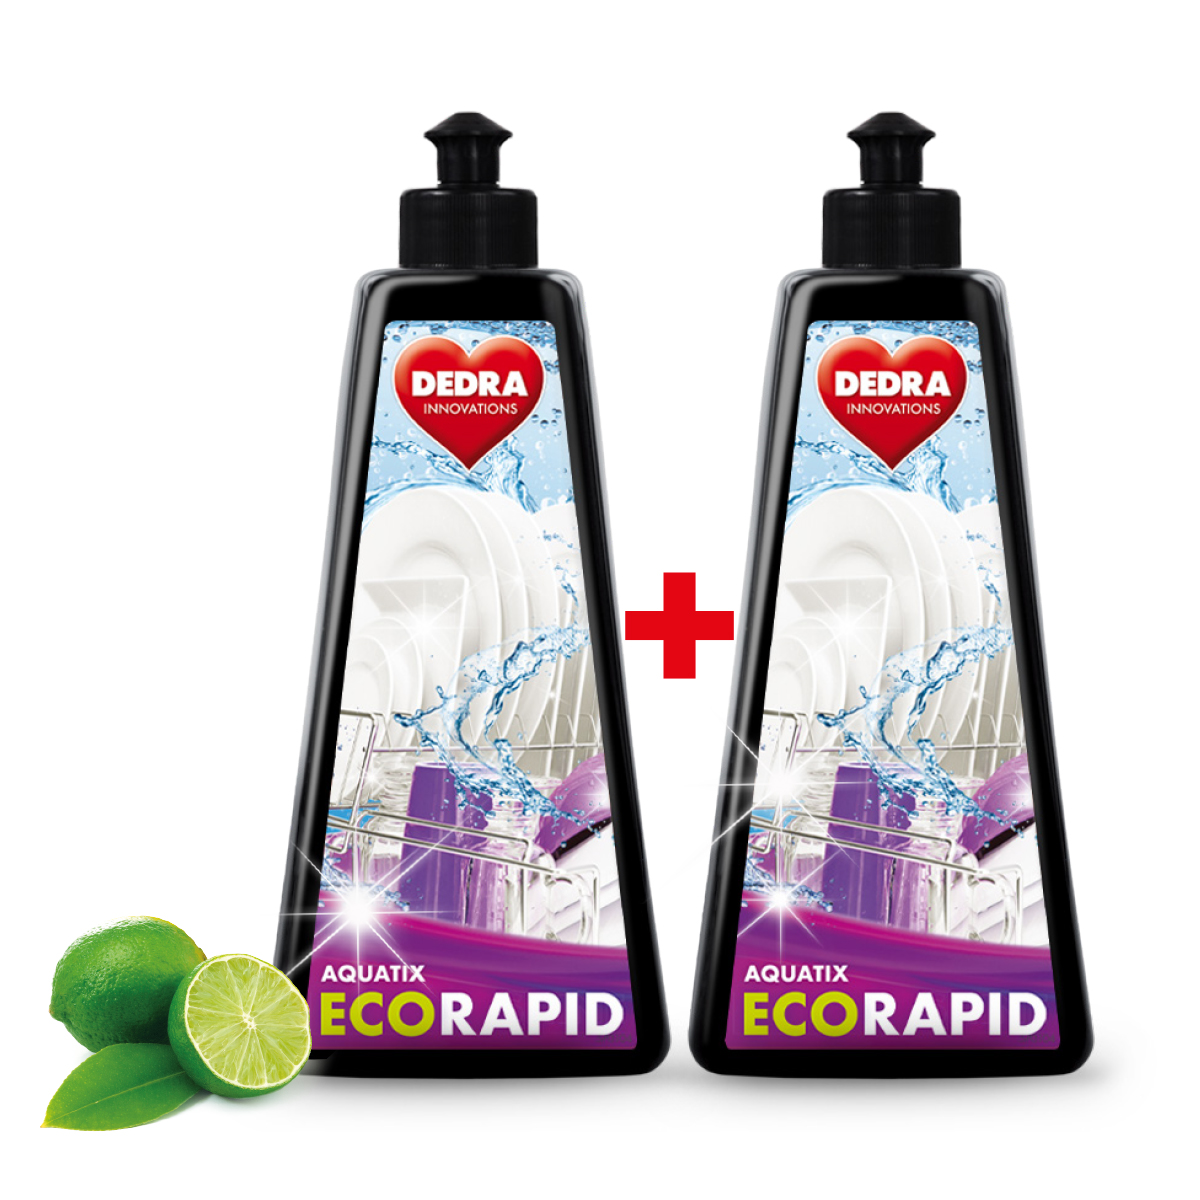 1+1 EKO gel do myčky ECORAPID AQUATIX® na 20 + 20 mycích cyklů